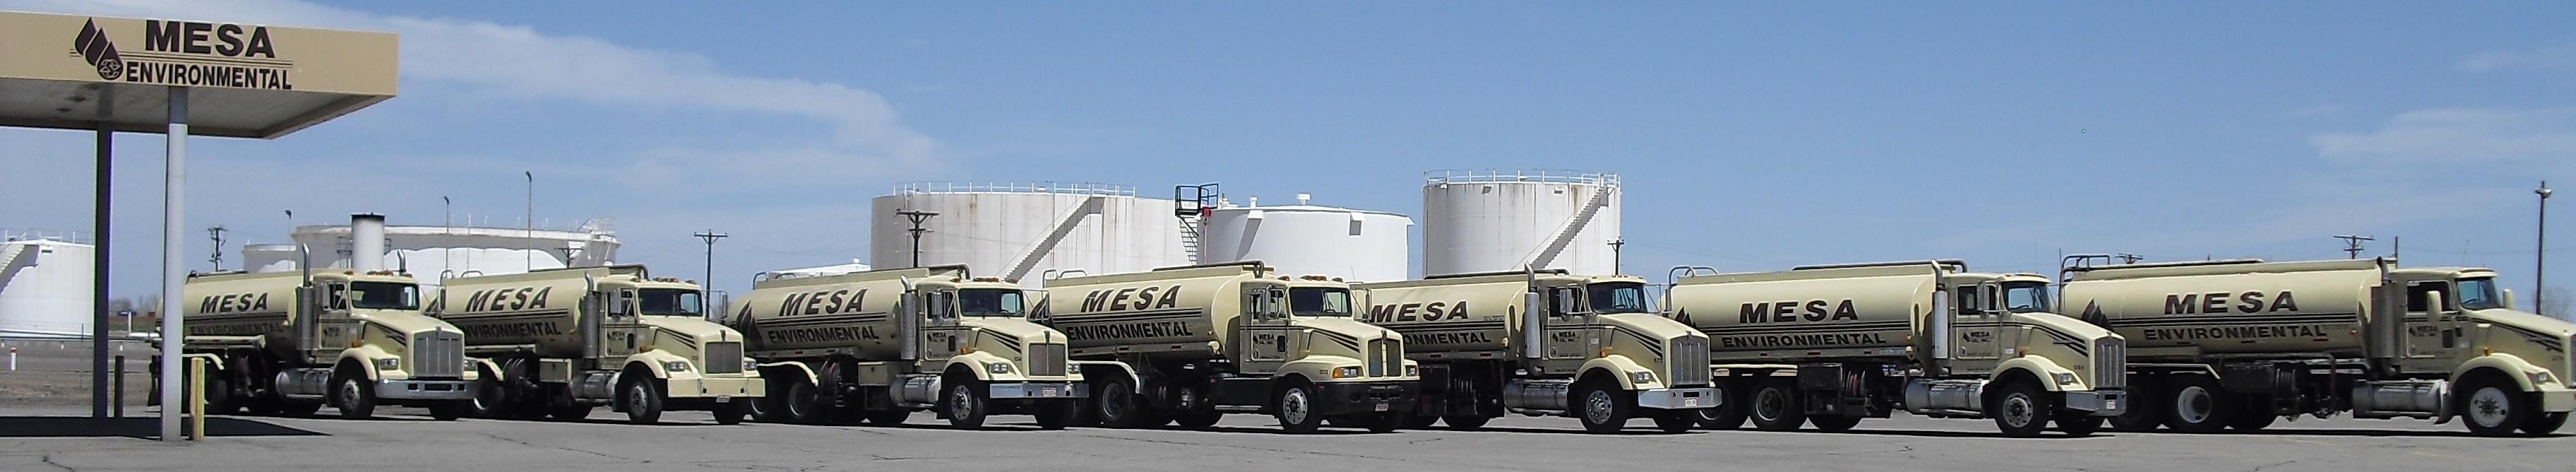 Mesa-Oil-Trucks (1)